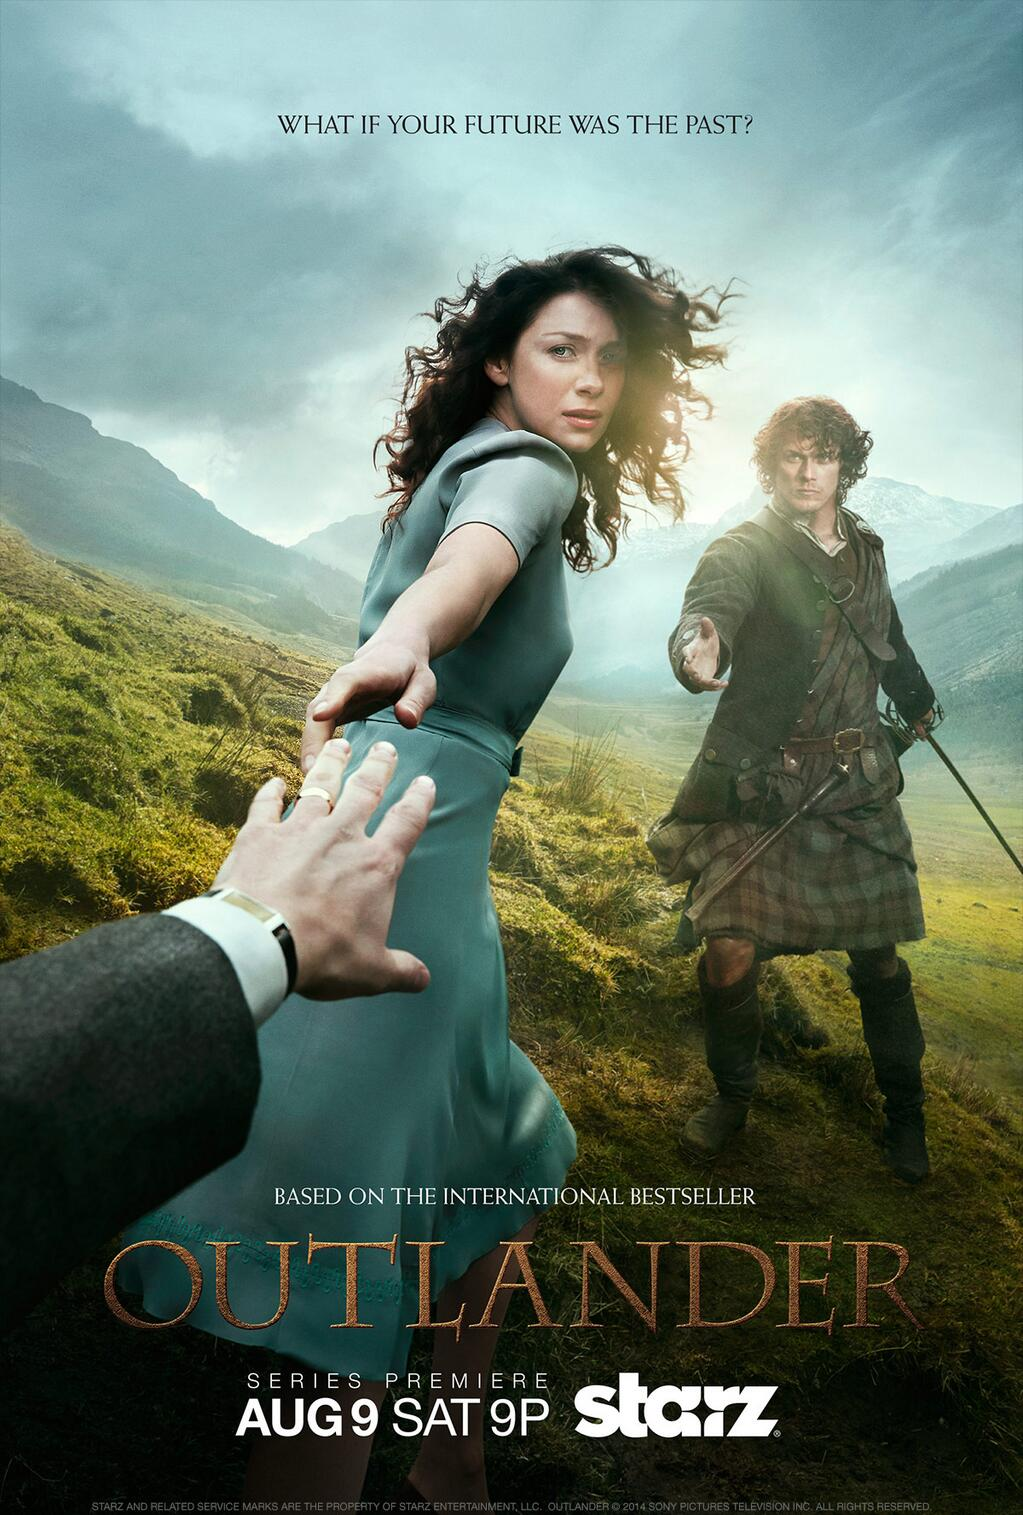 'Outlander' Starz poster with key art